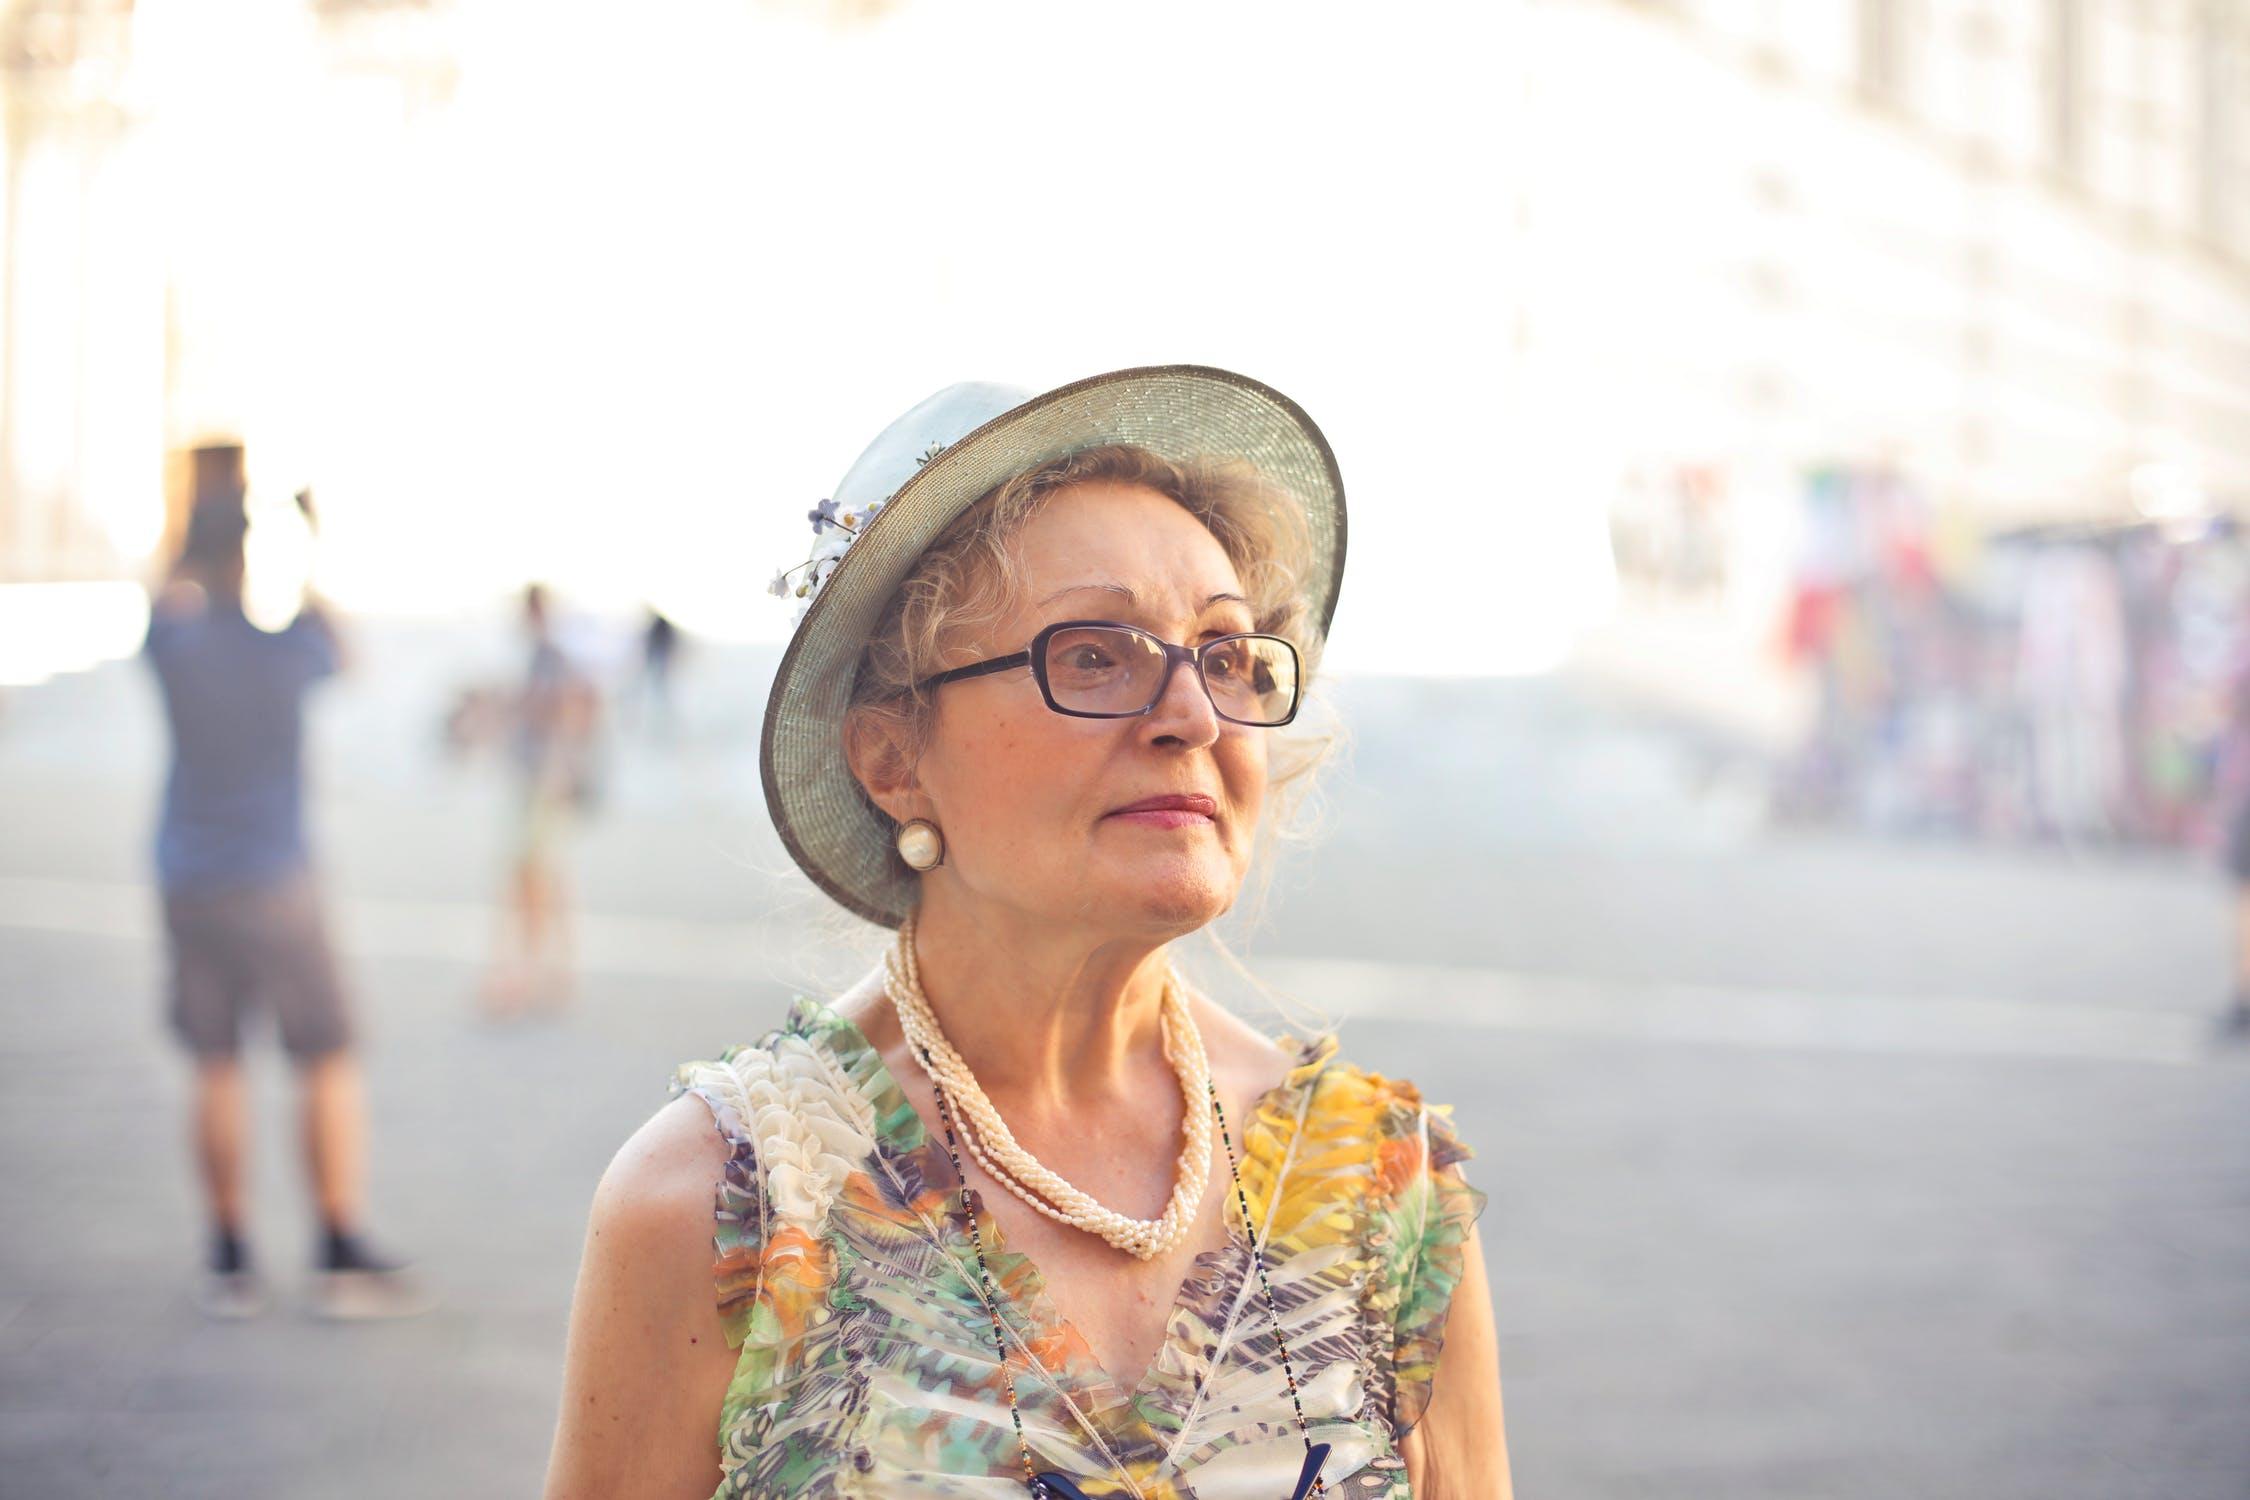 WOW Group - Women of Wisdom, 55+